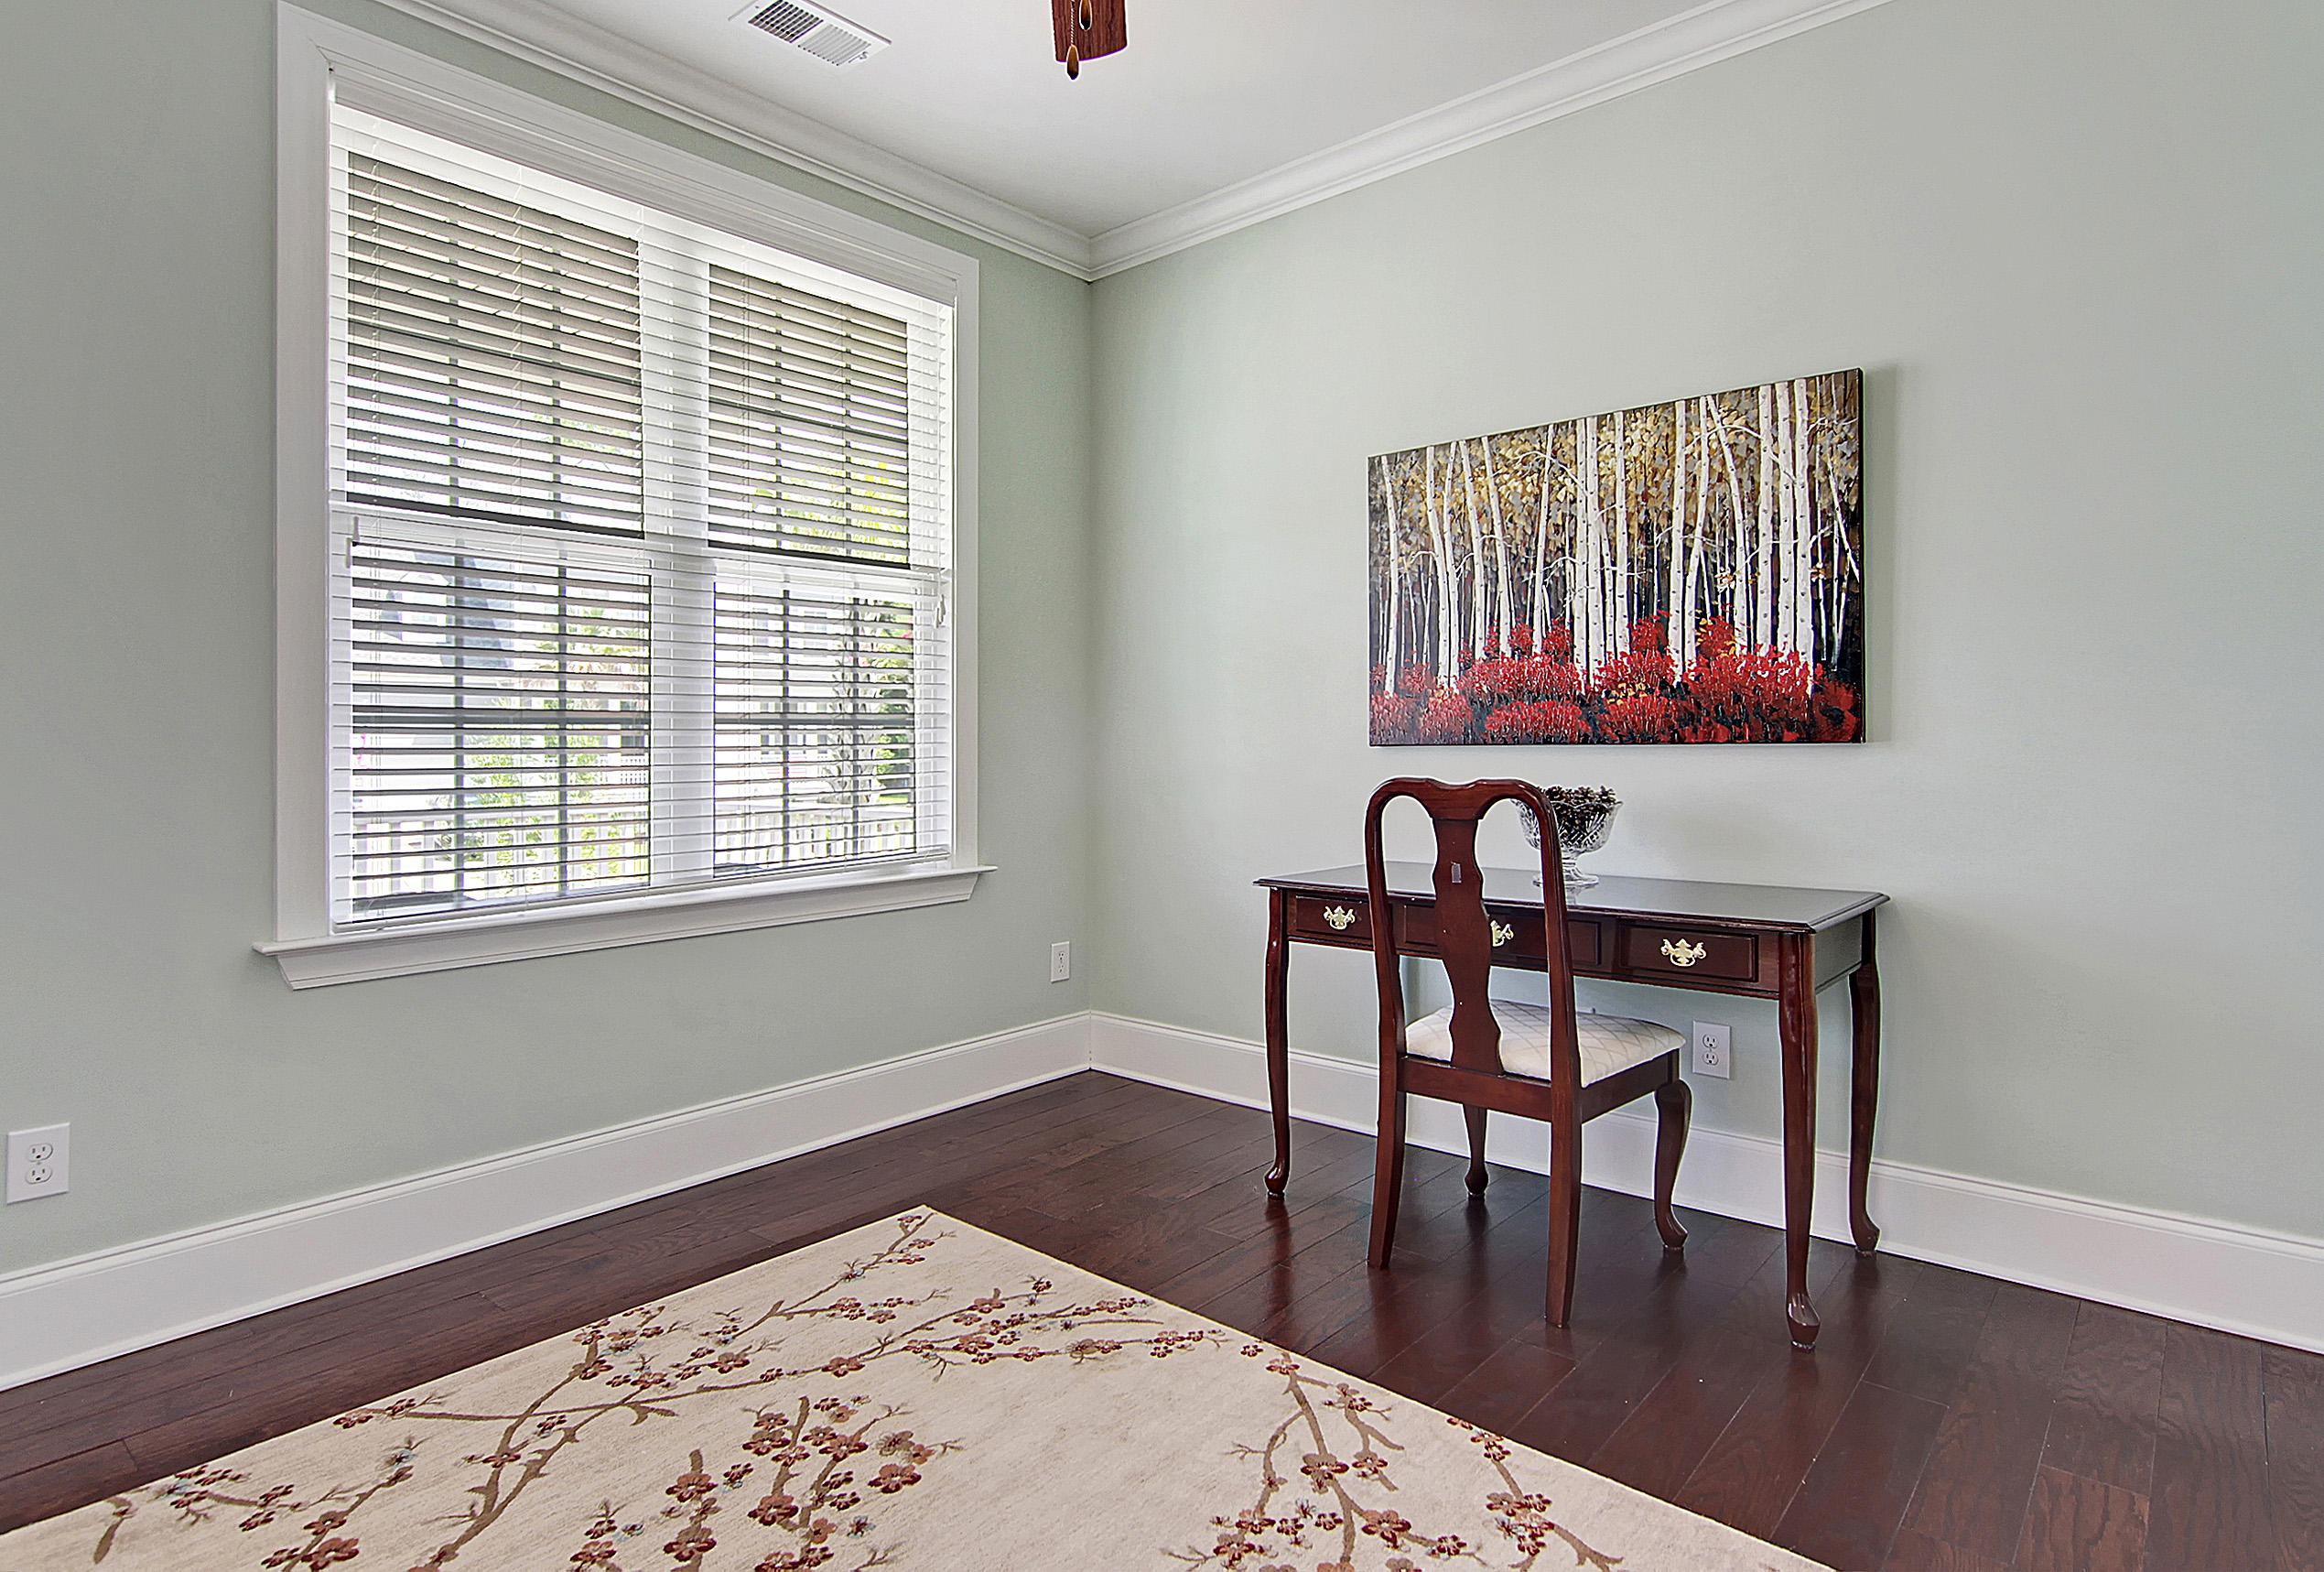 Dunes West Homes For Sale - 1332 Whisker Pole, Mount Pleasant, SC - 23